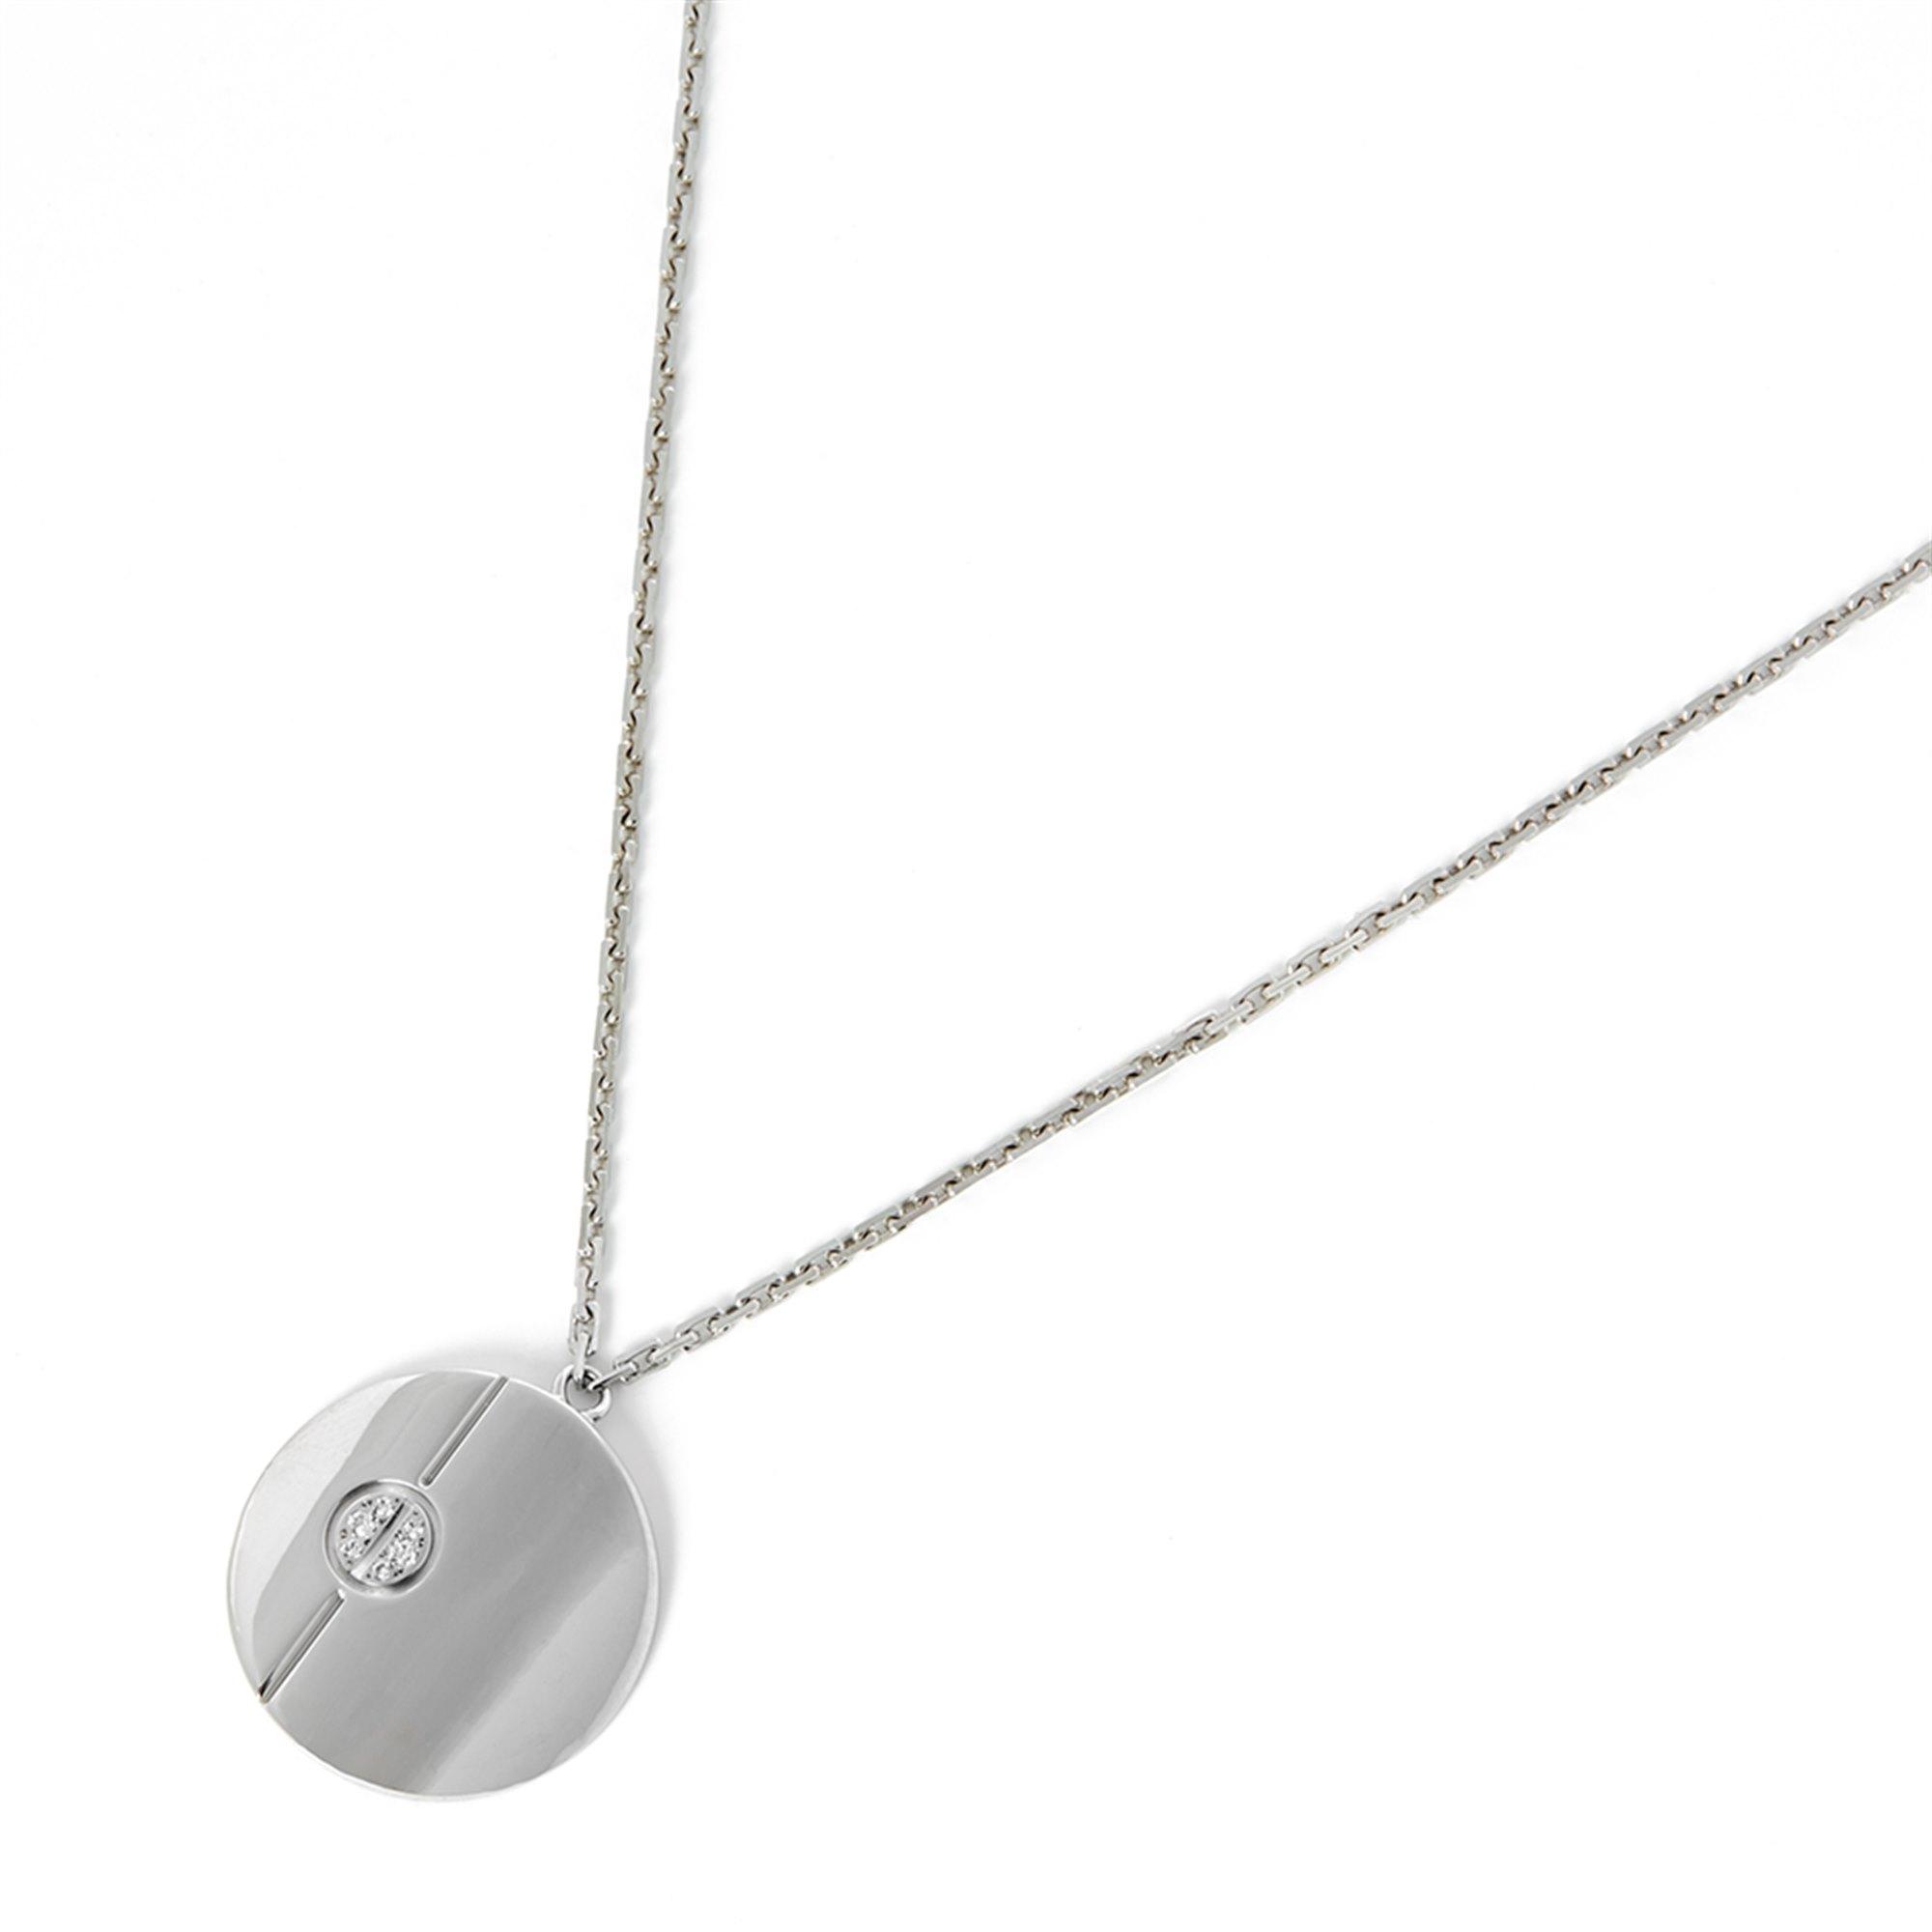 b5bebf6b8ea 18k White Gold Diamond Love Pendant Necklace